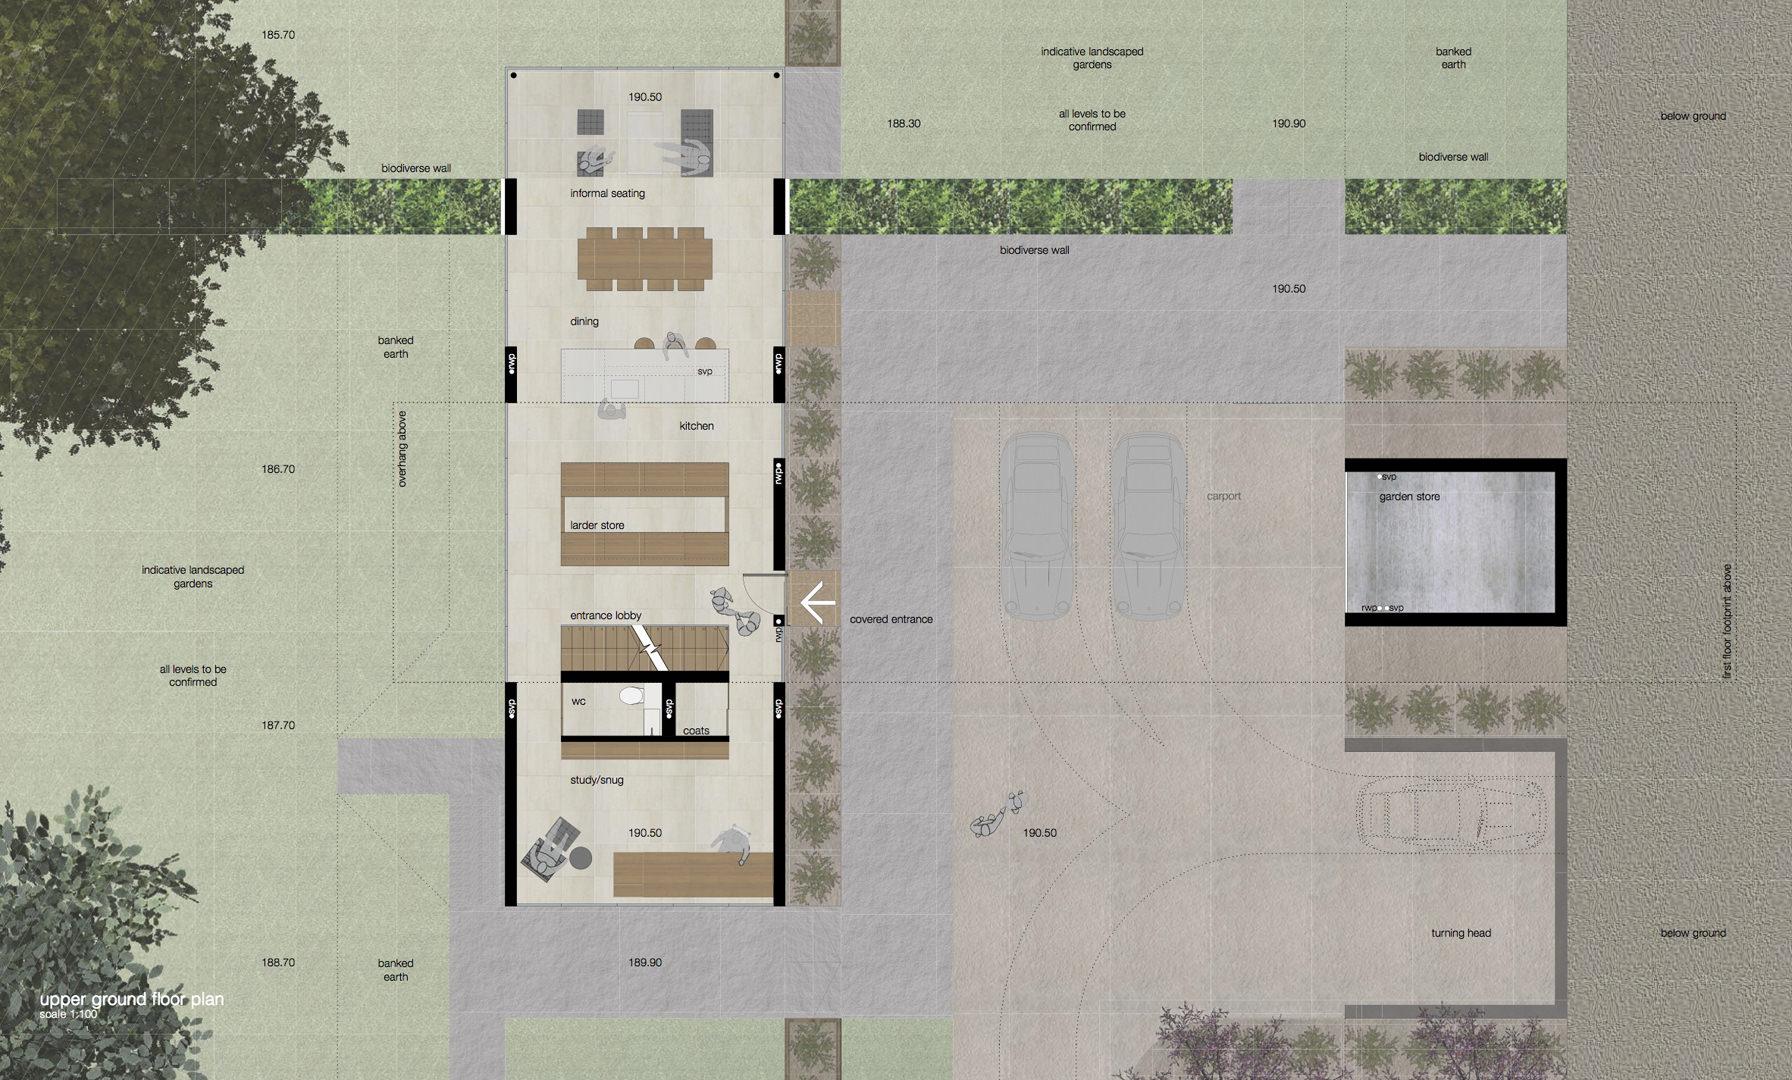 proposed upper ground floor plan